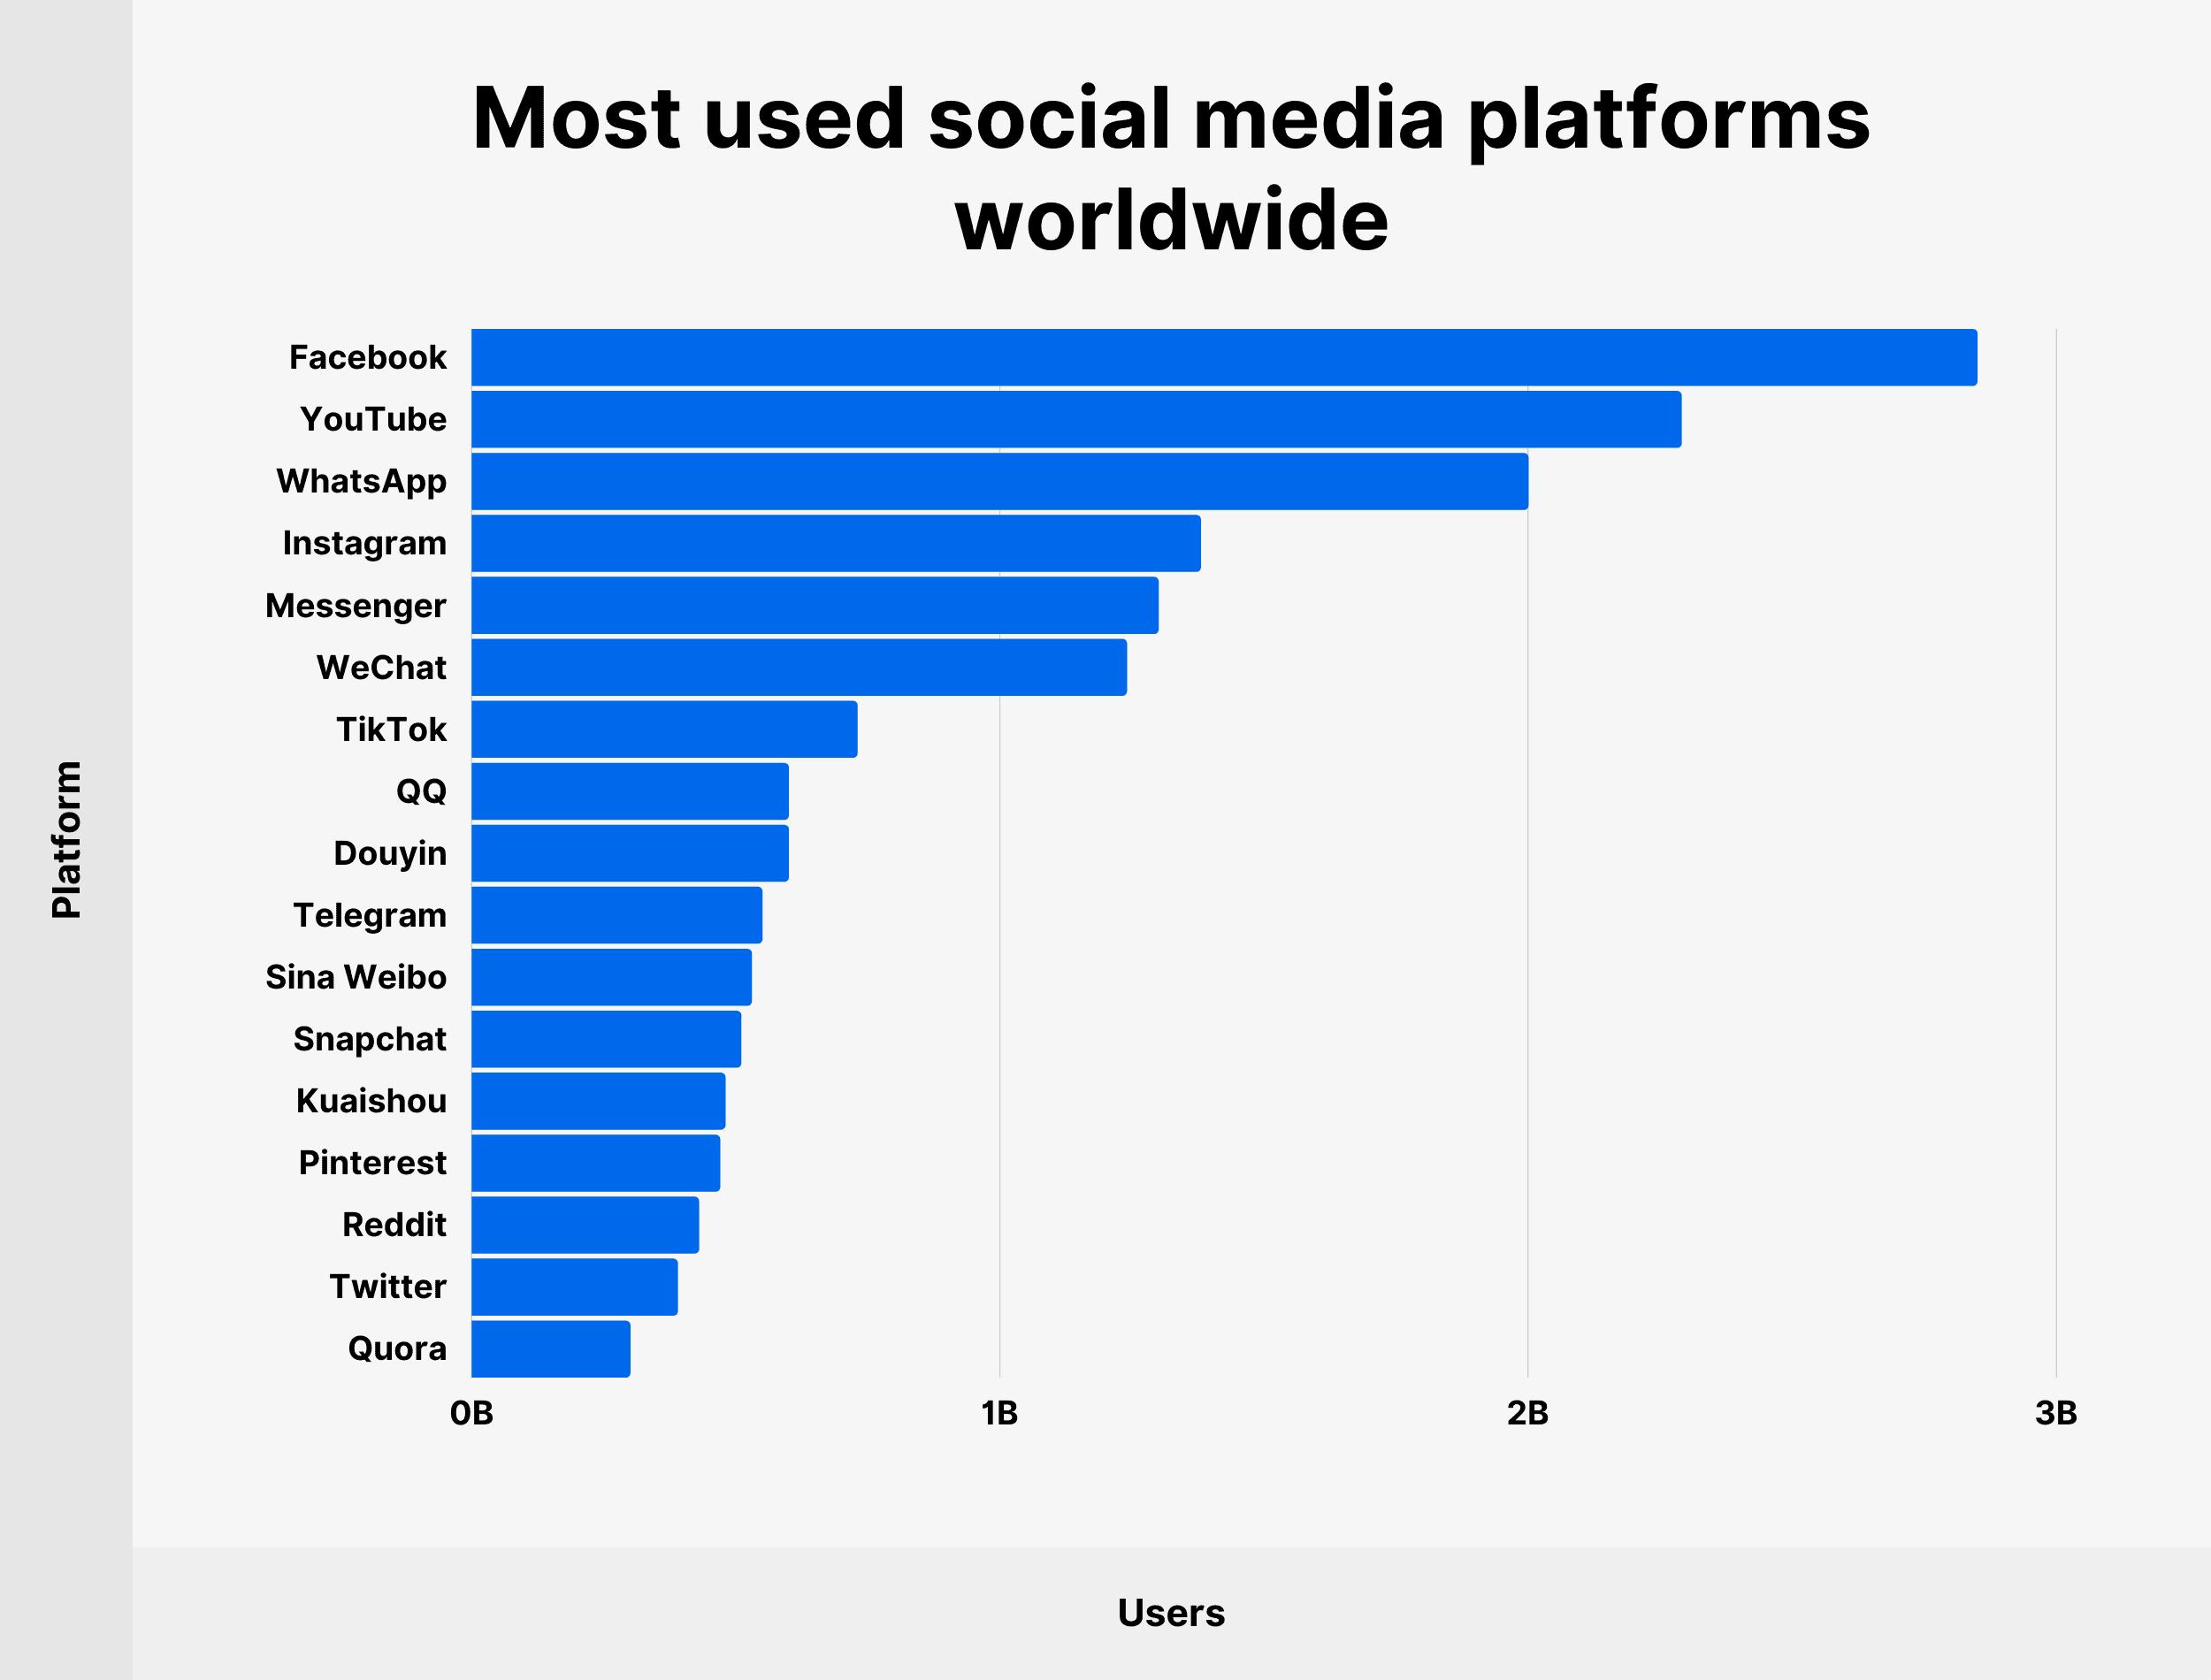 Most used social media platforms worldwide